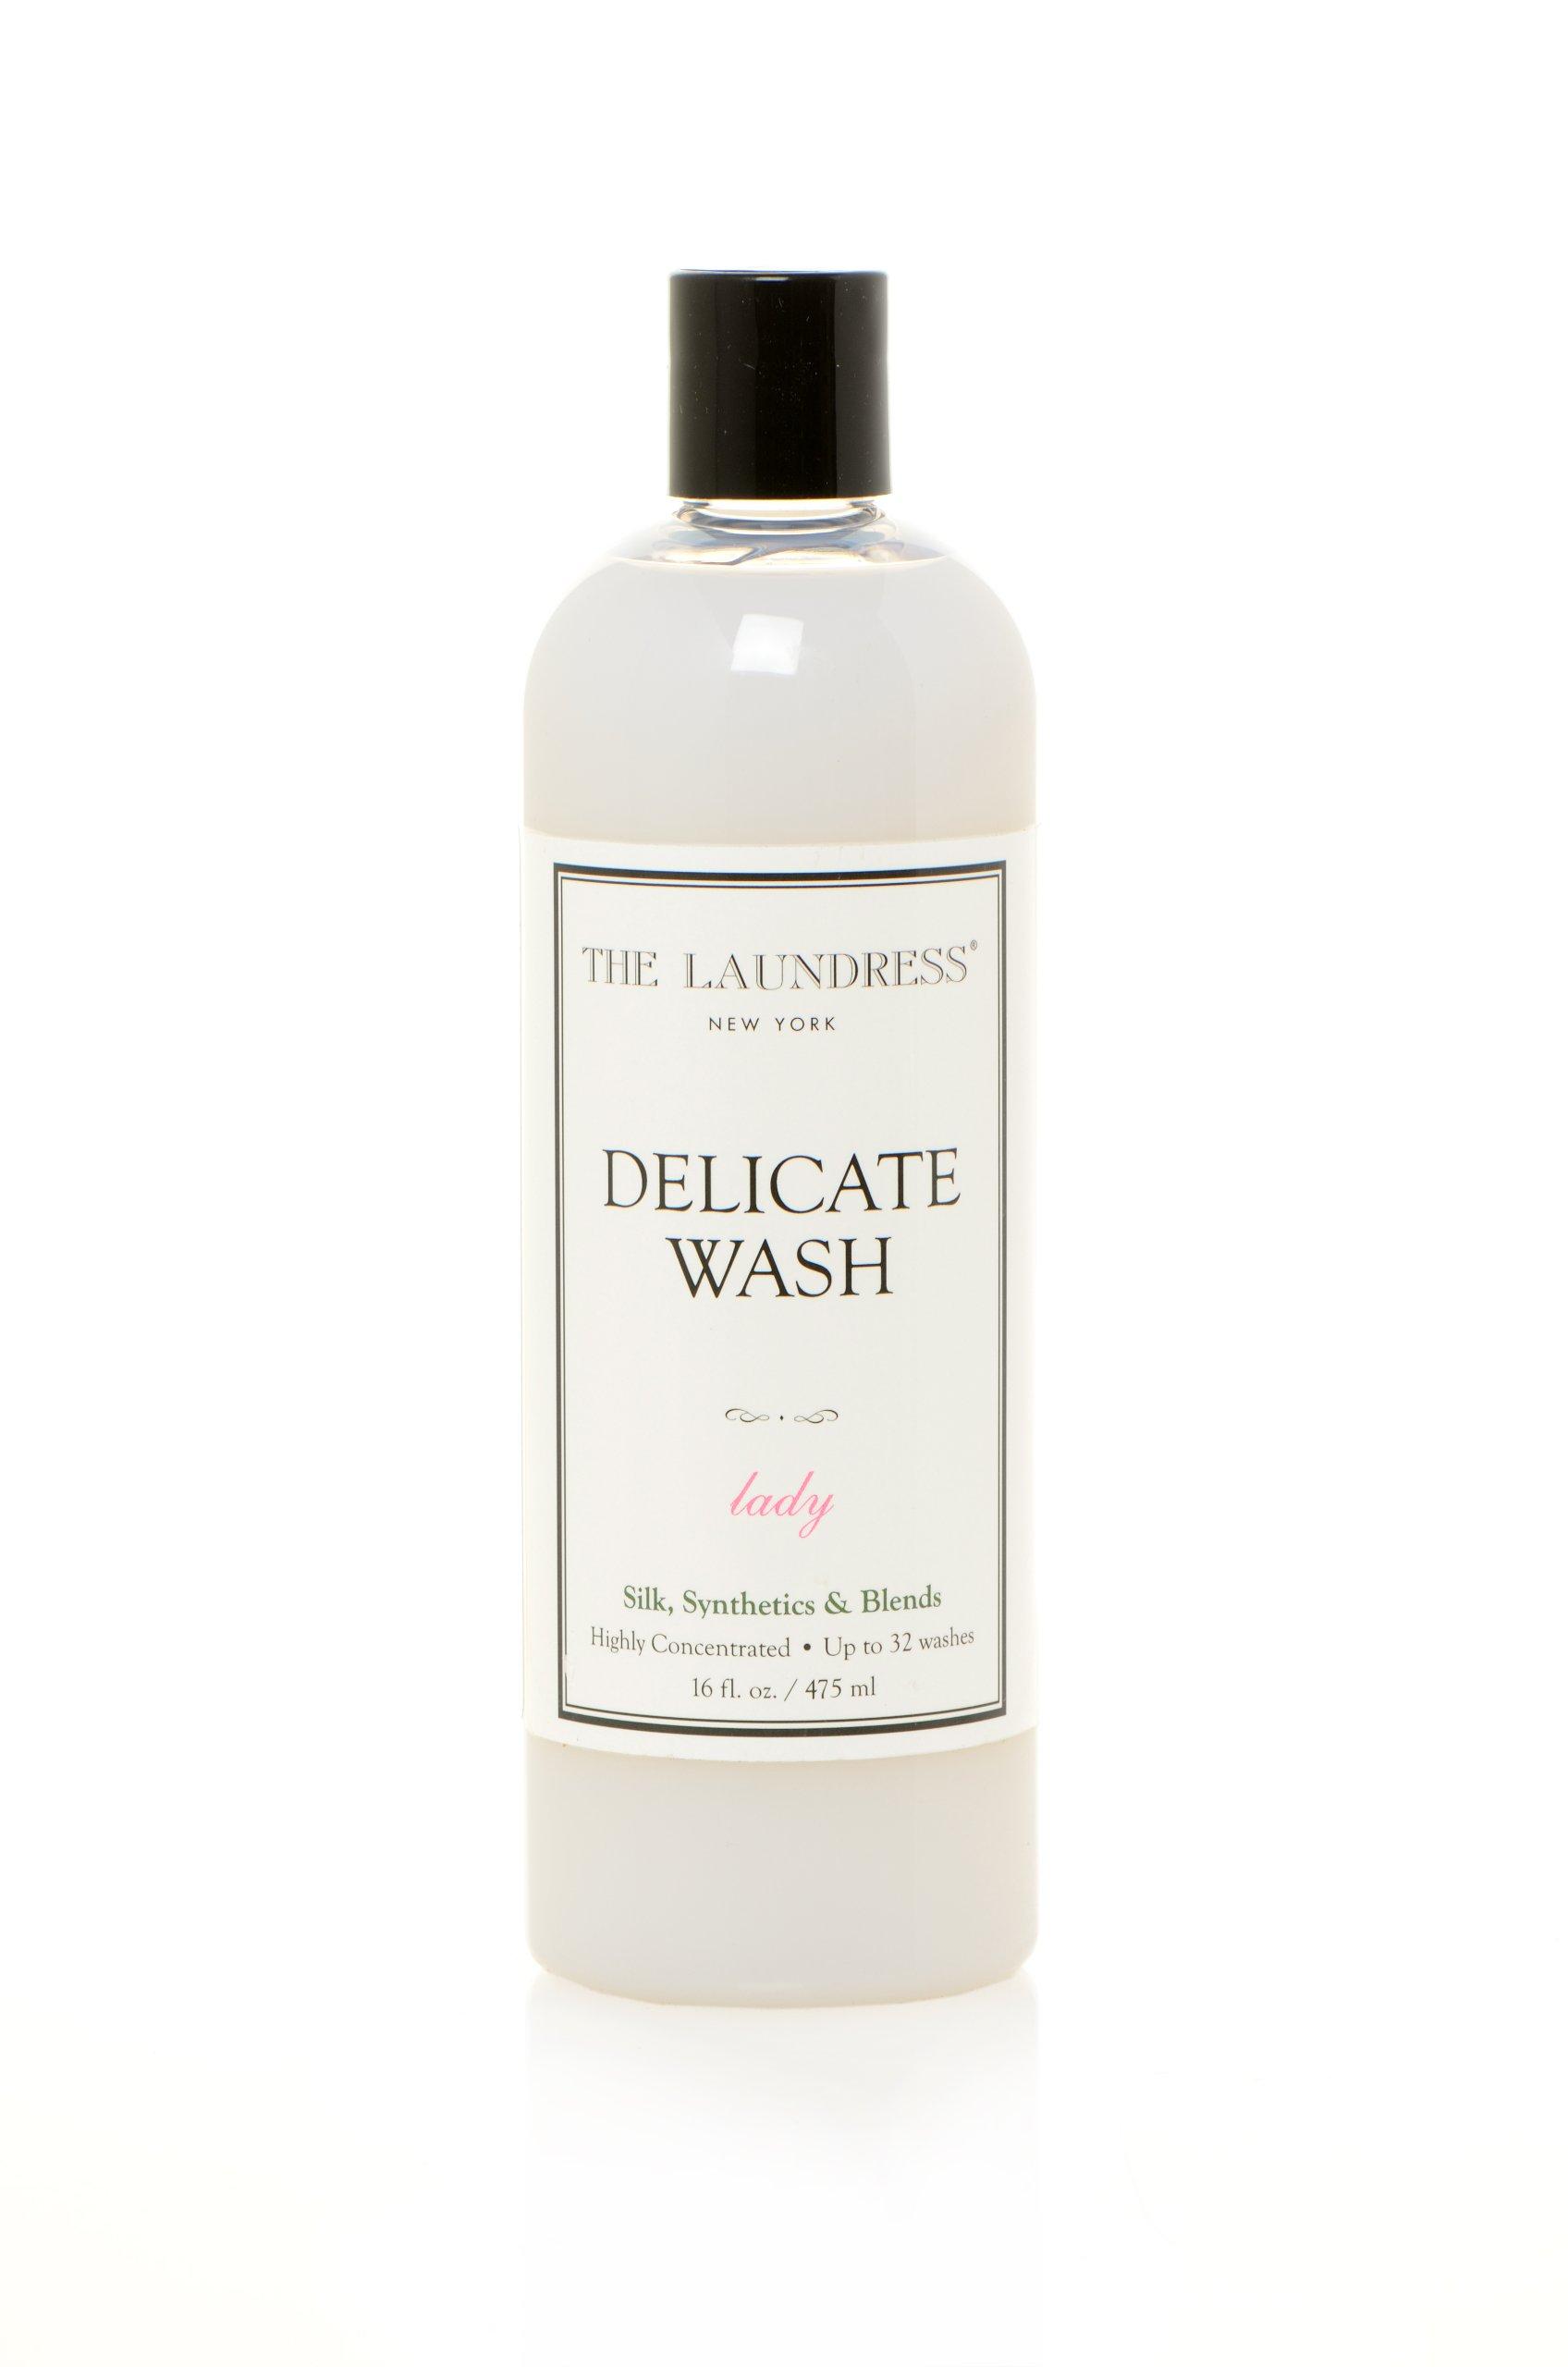 The Laundress Delicate Wash, Lady, 16 fl. oz. – 32 loads